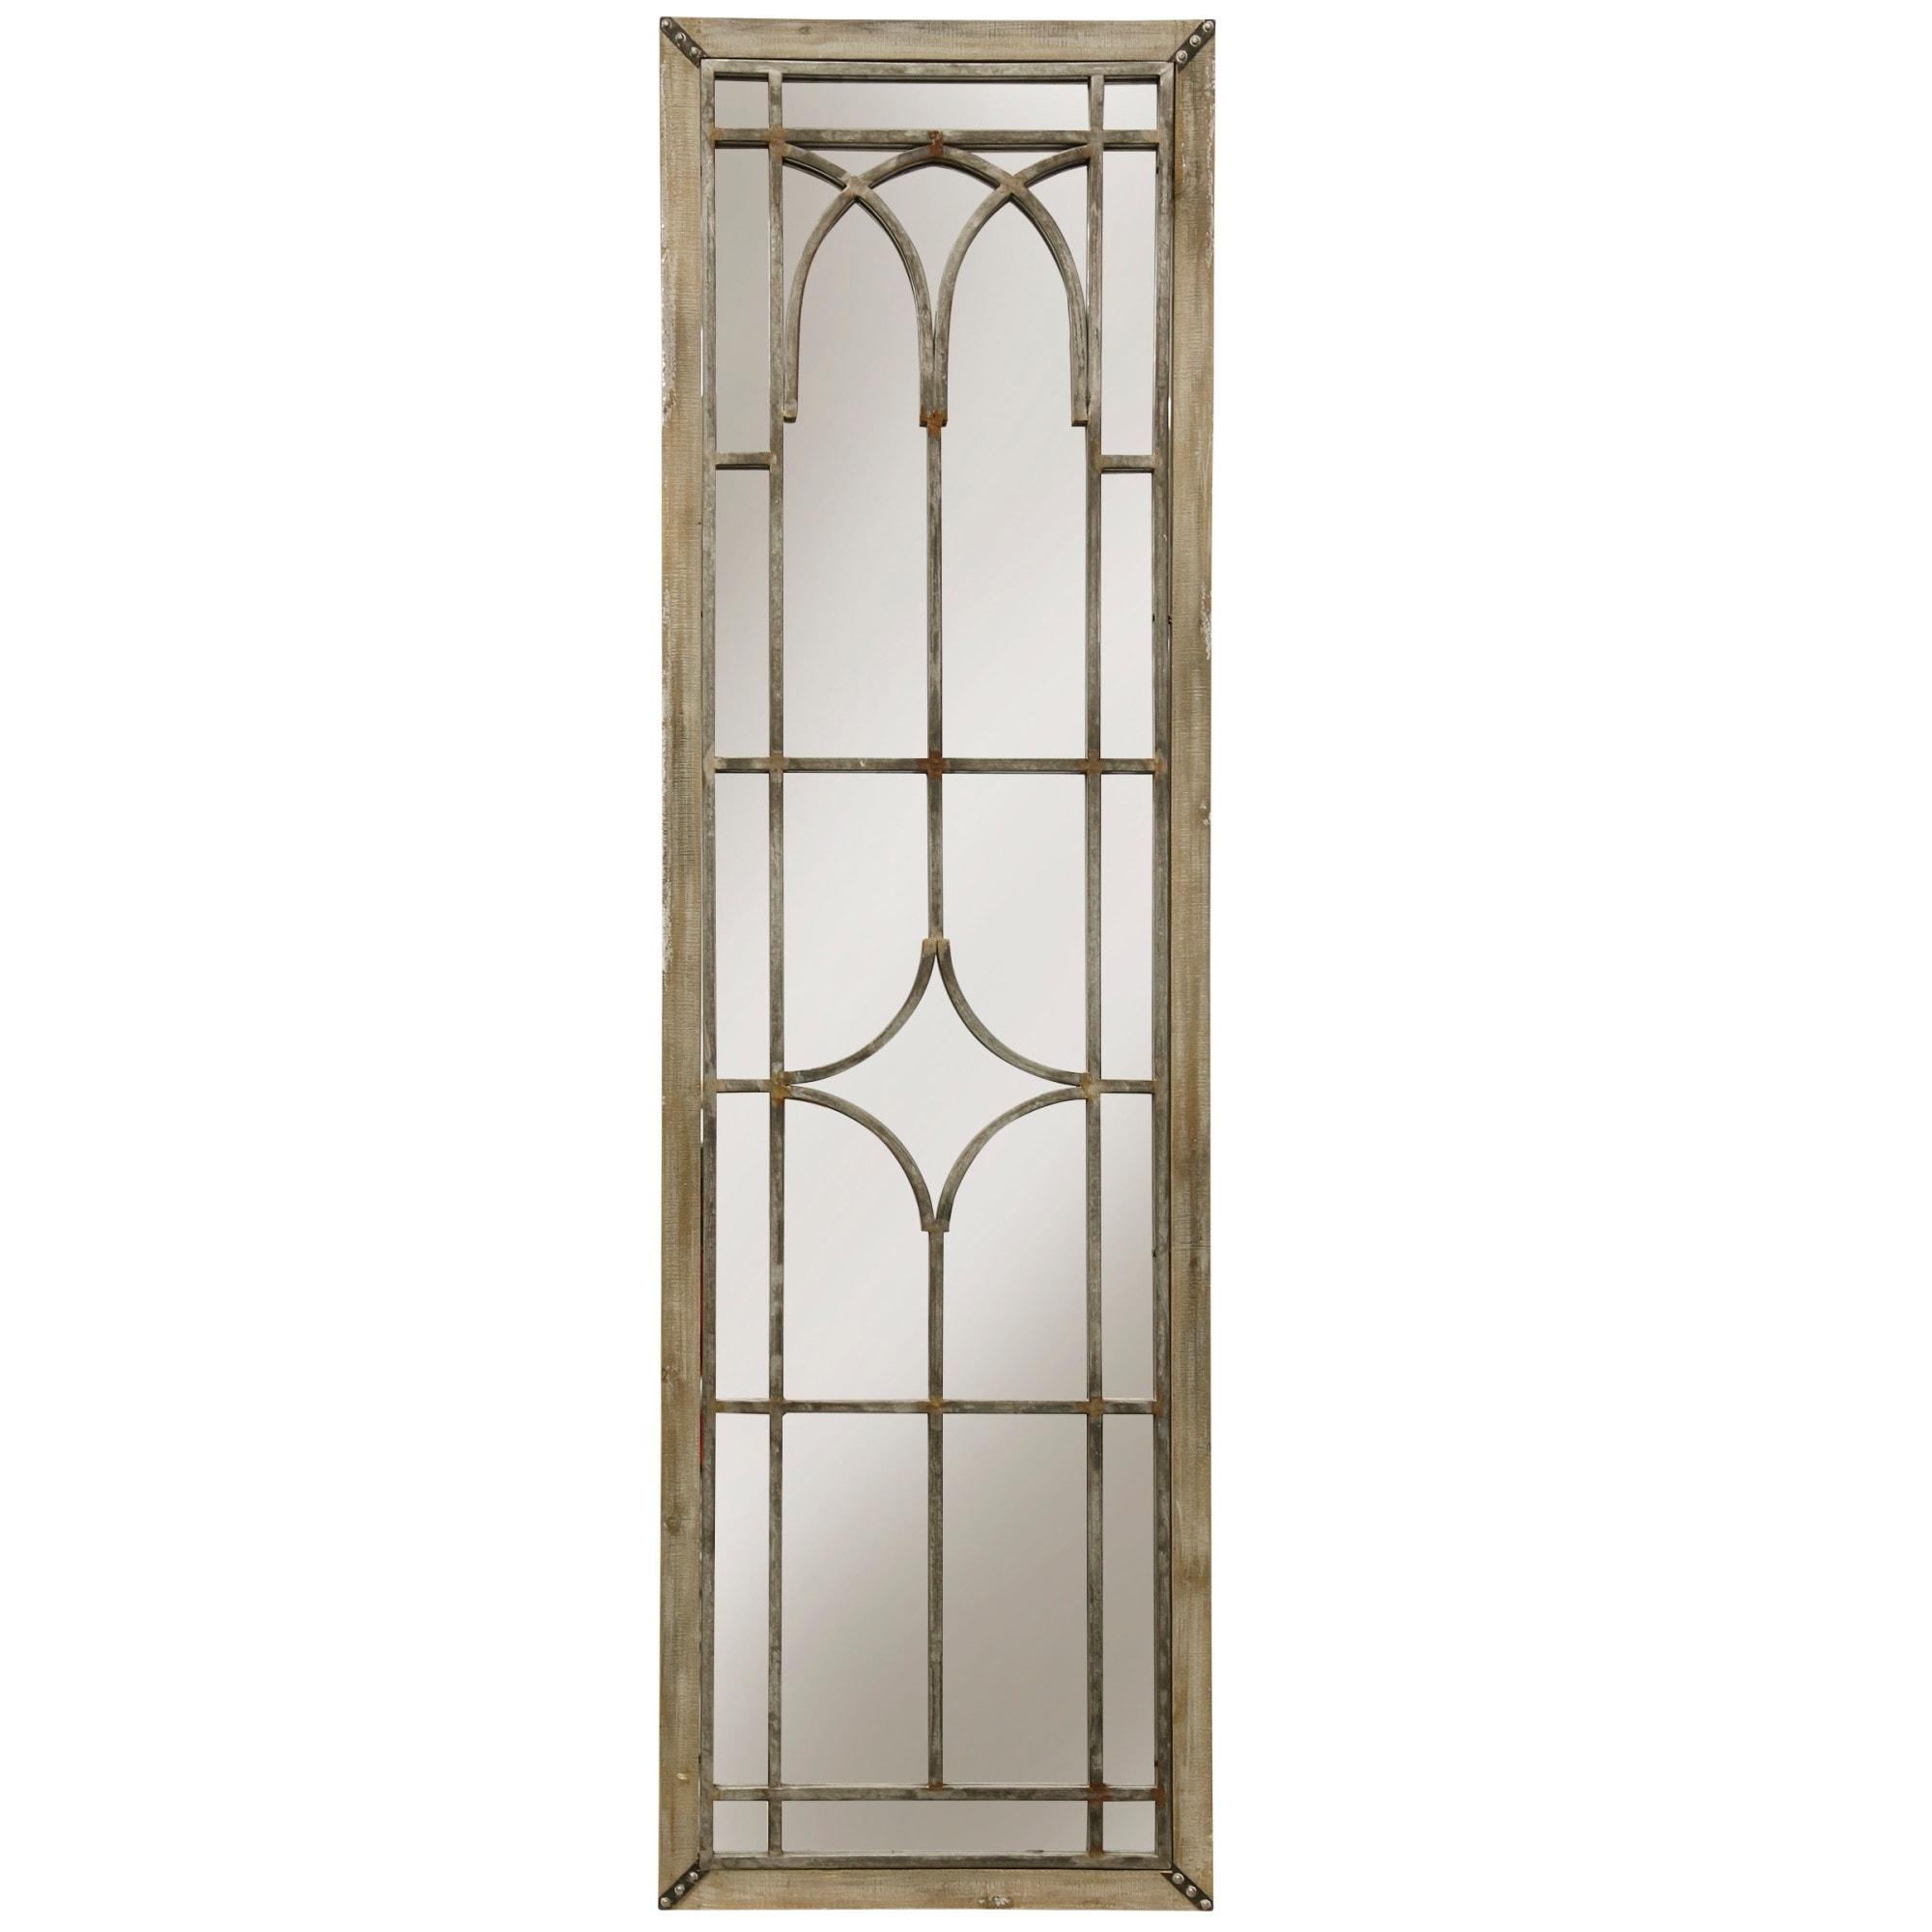 StyleCraft SC-WI52416  20 x 70 Rectangular Flat Wood Framed Wall Mounted Decorative Panel Mirror - Natural Wood